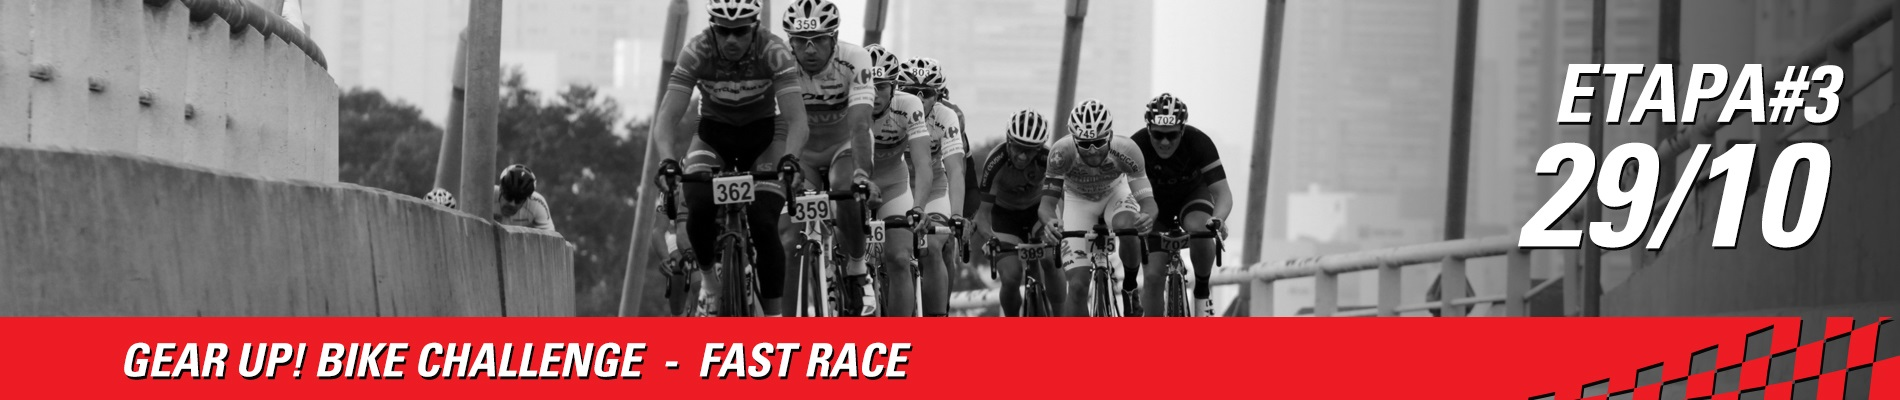 GEAR UP! BIKE CHALLENGE - FAST RACE ETAPA 3 - Imagem de topo